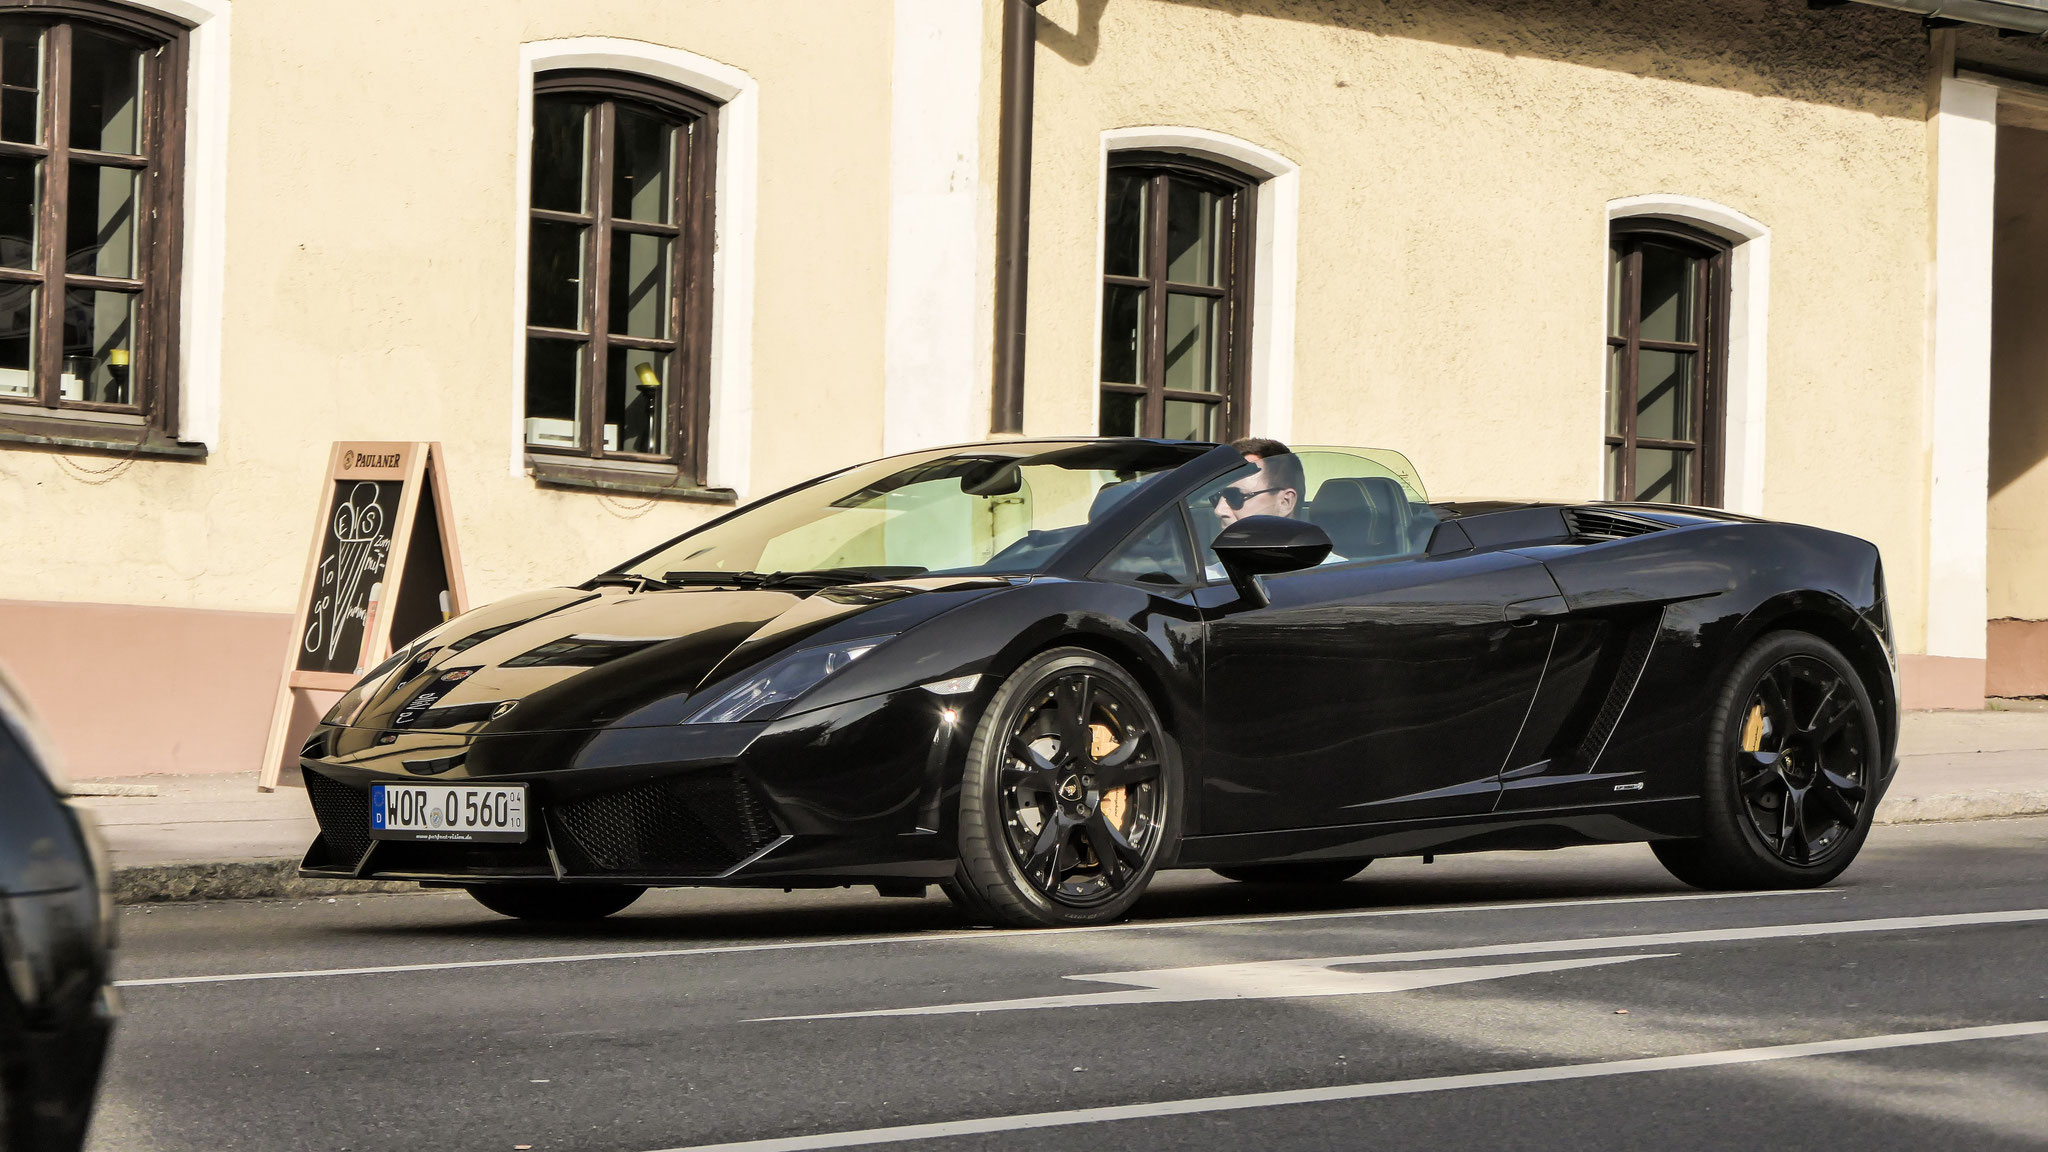 Lamborghini Gallardo Spyder - WOR-O-560